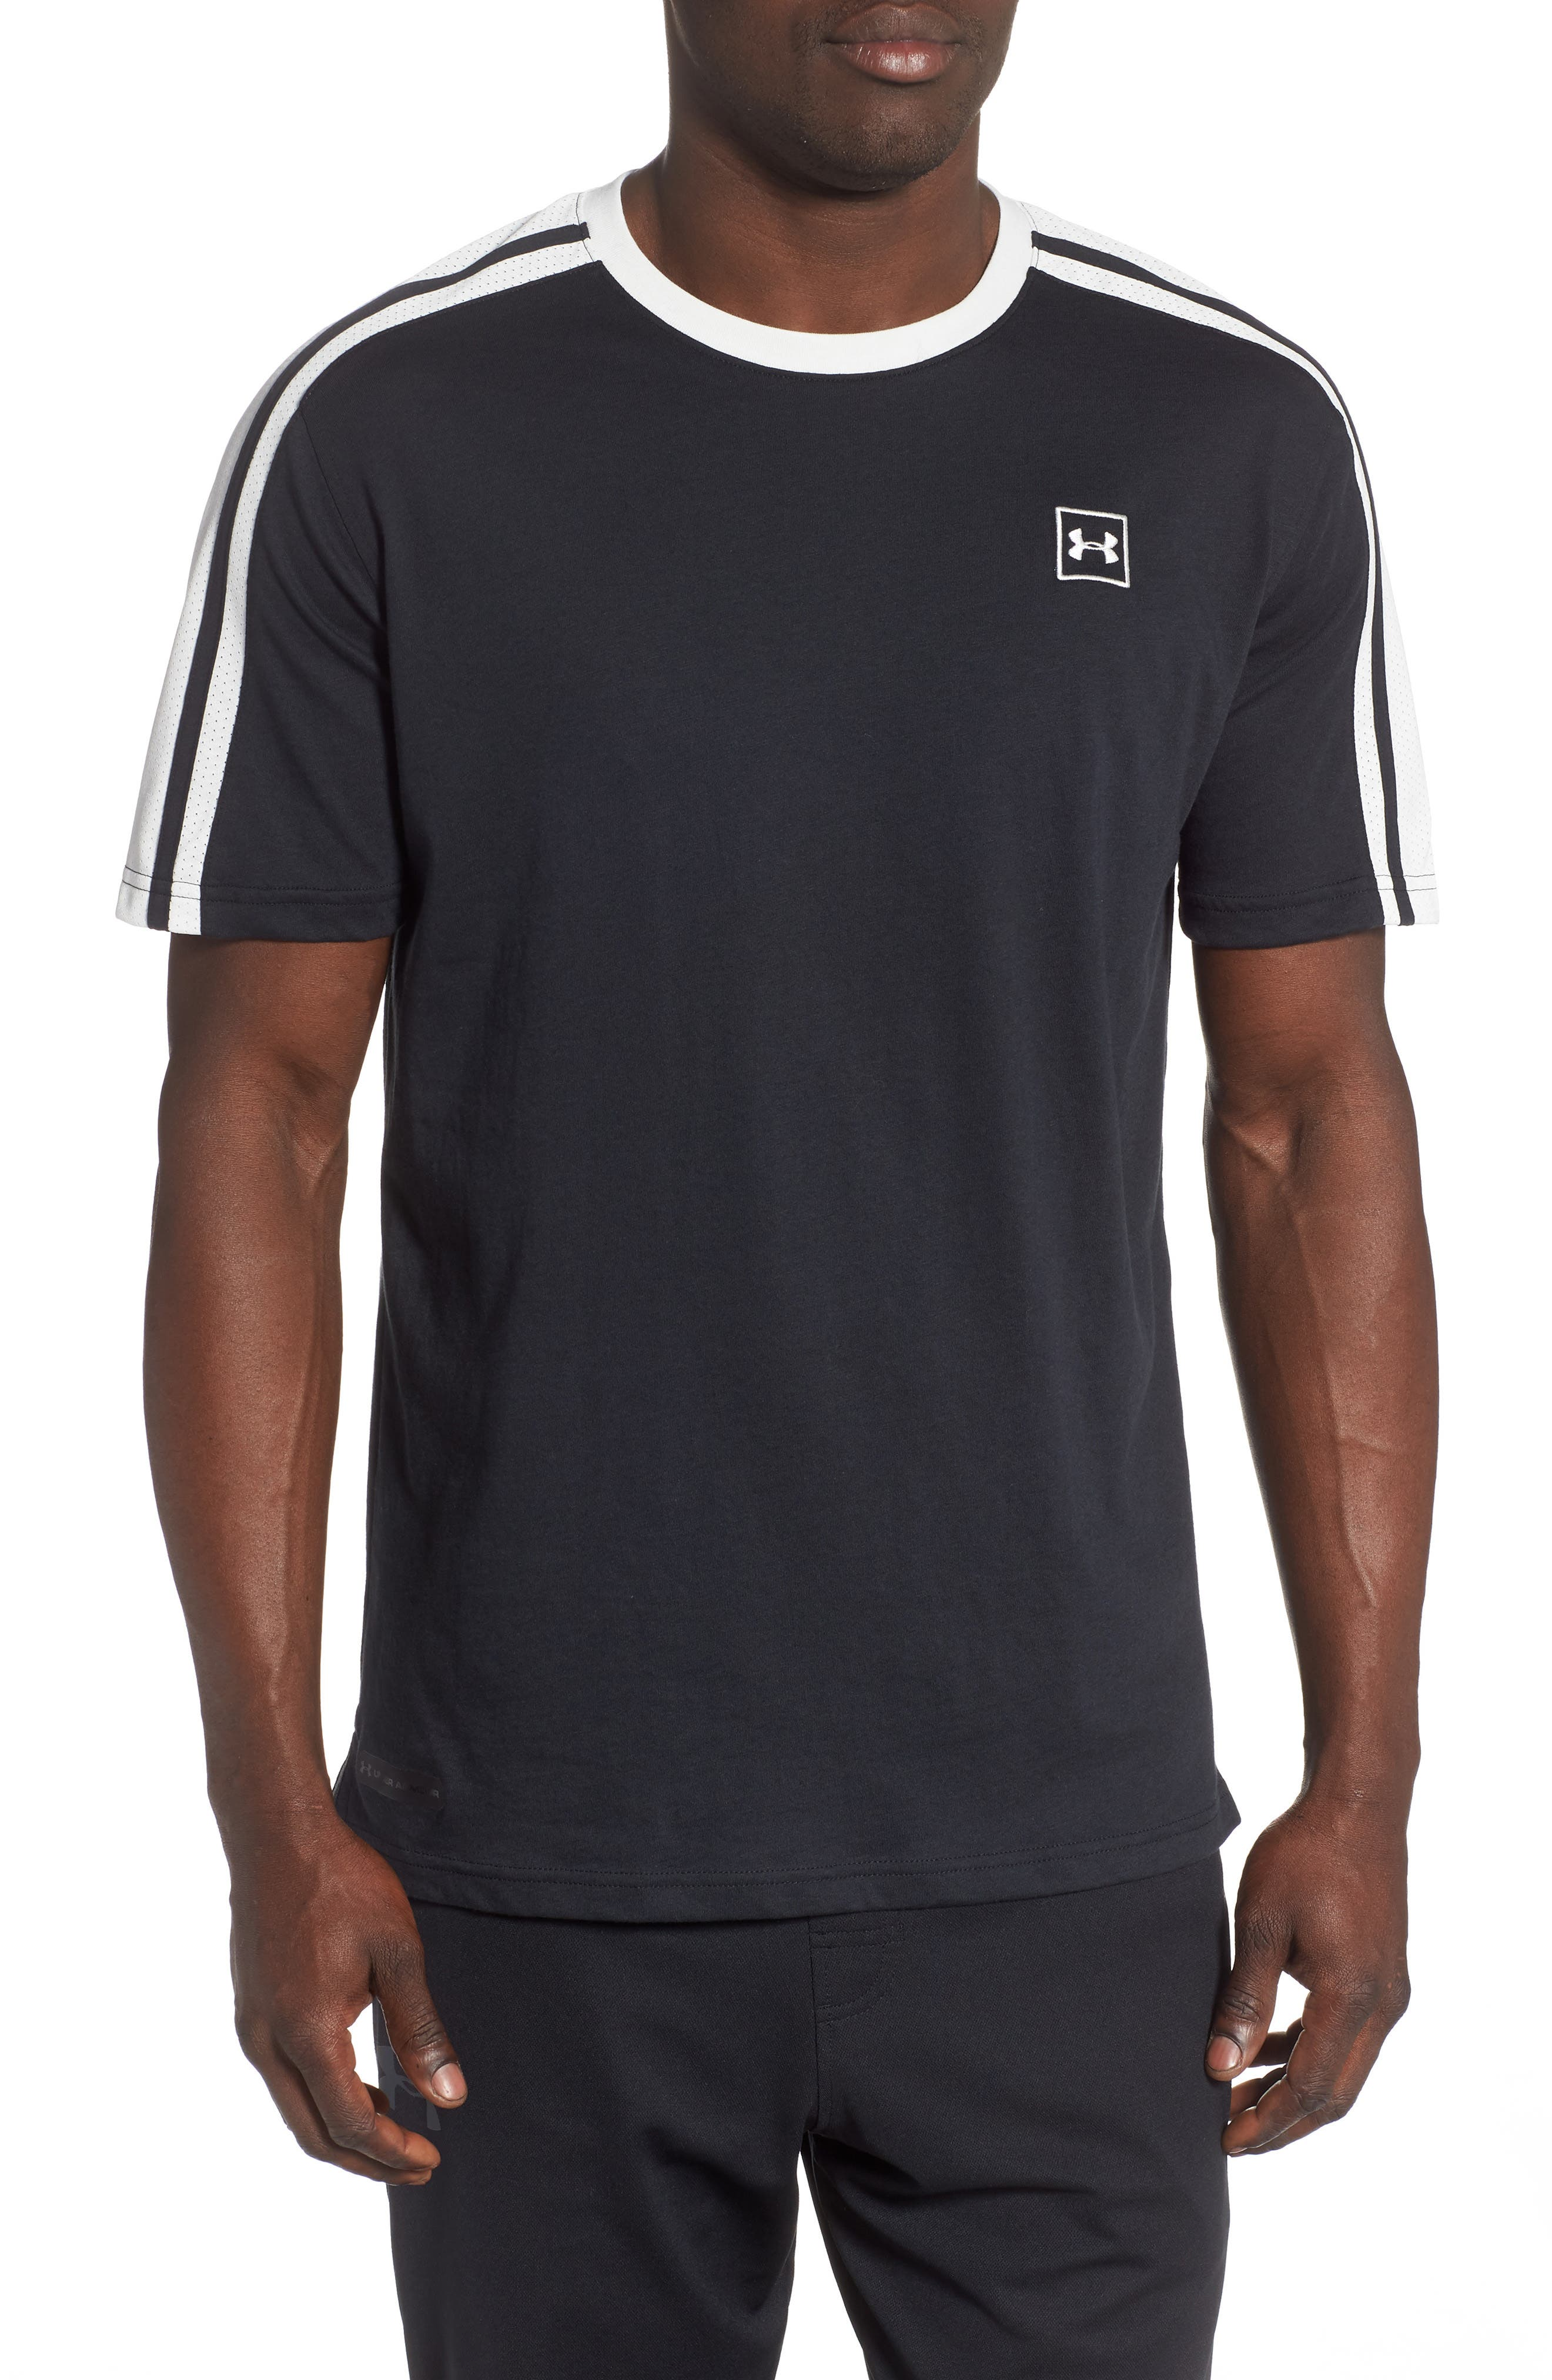 Under Armour Unstoppable Stripe T-Shirt, Black